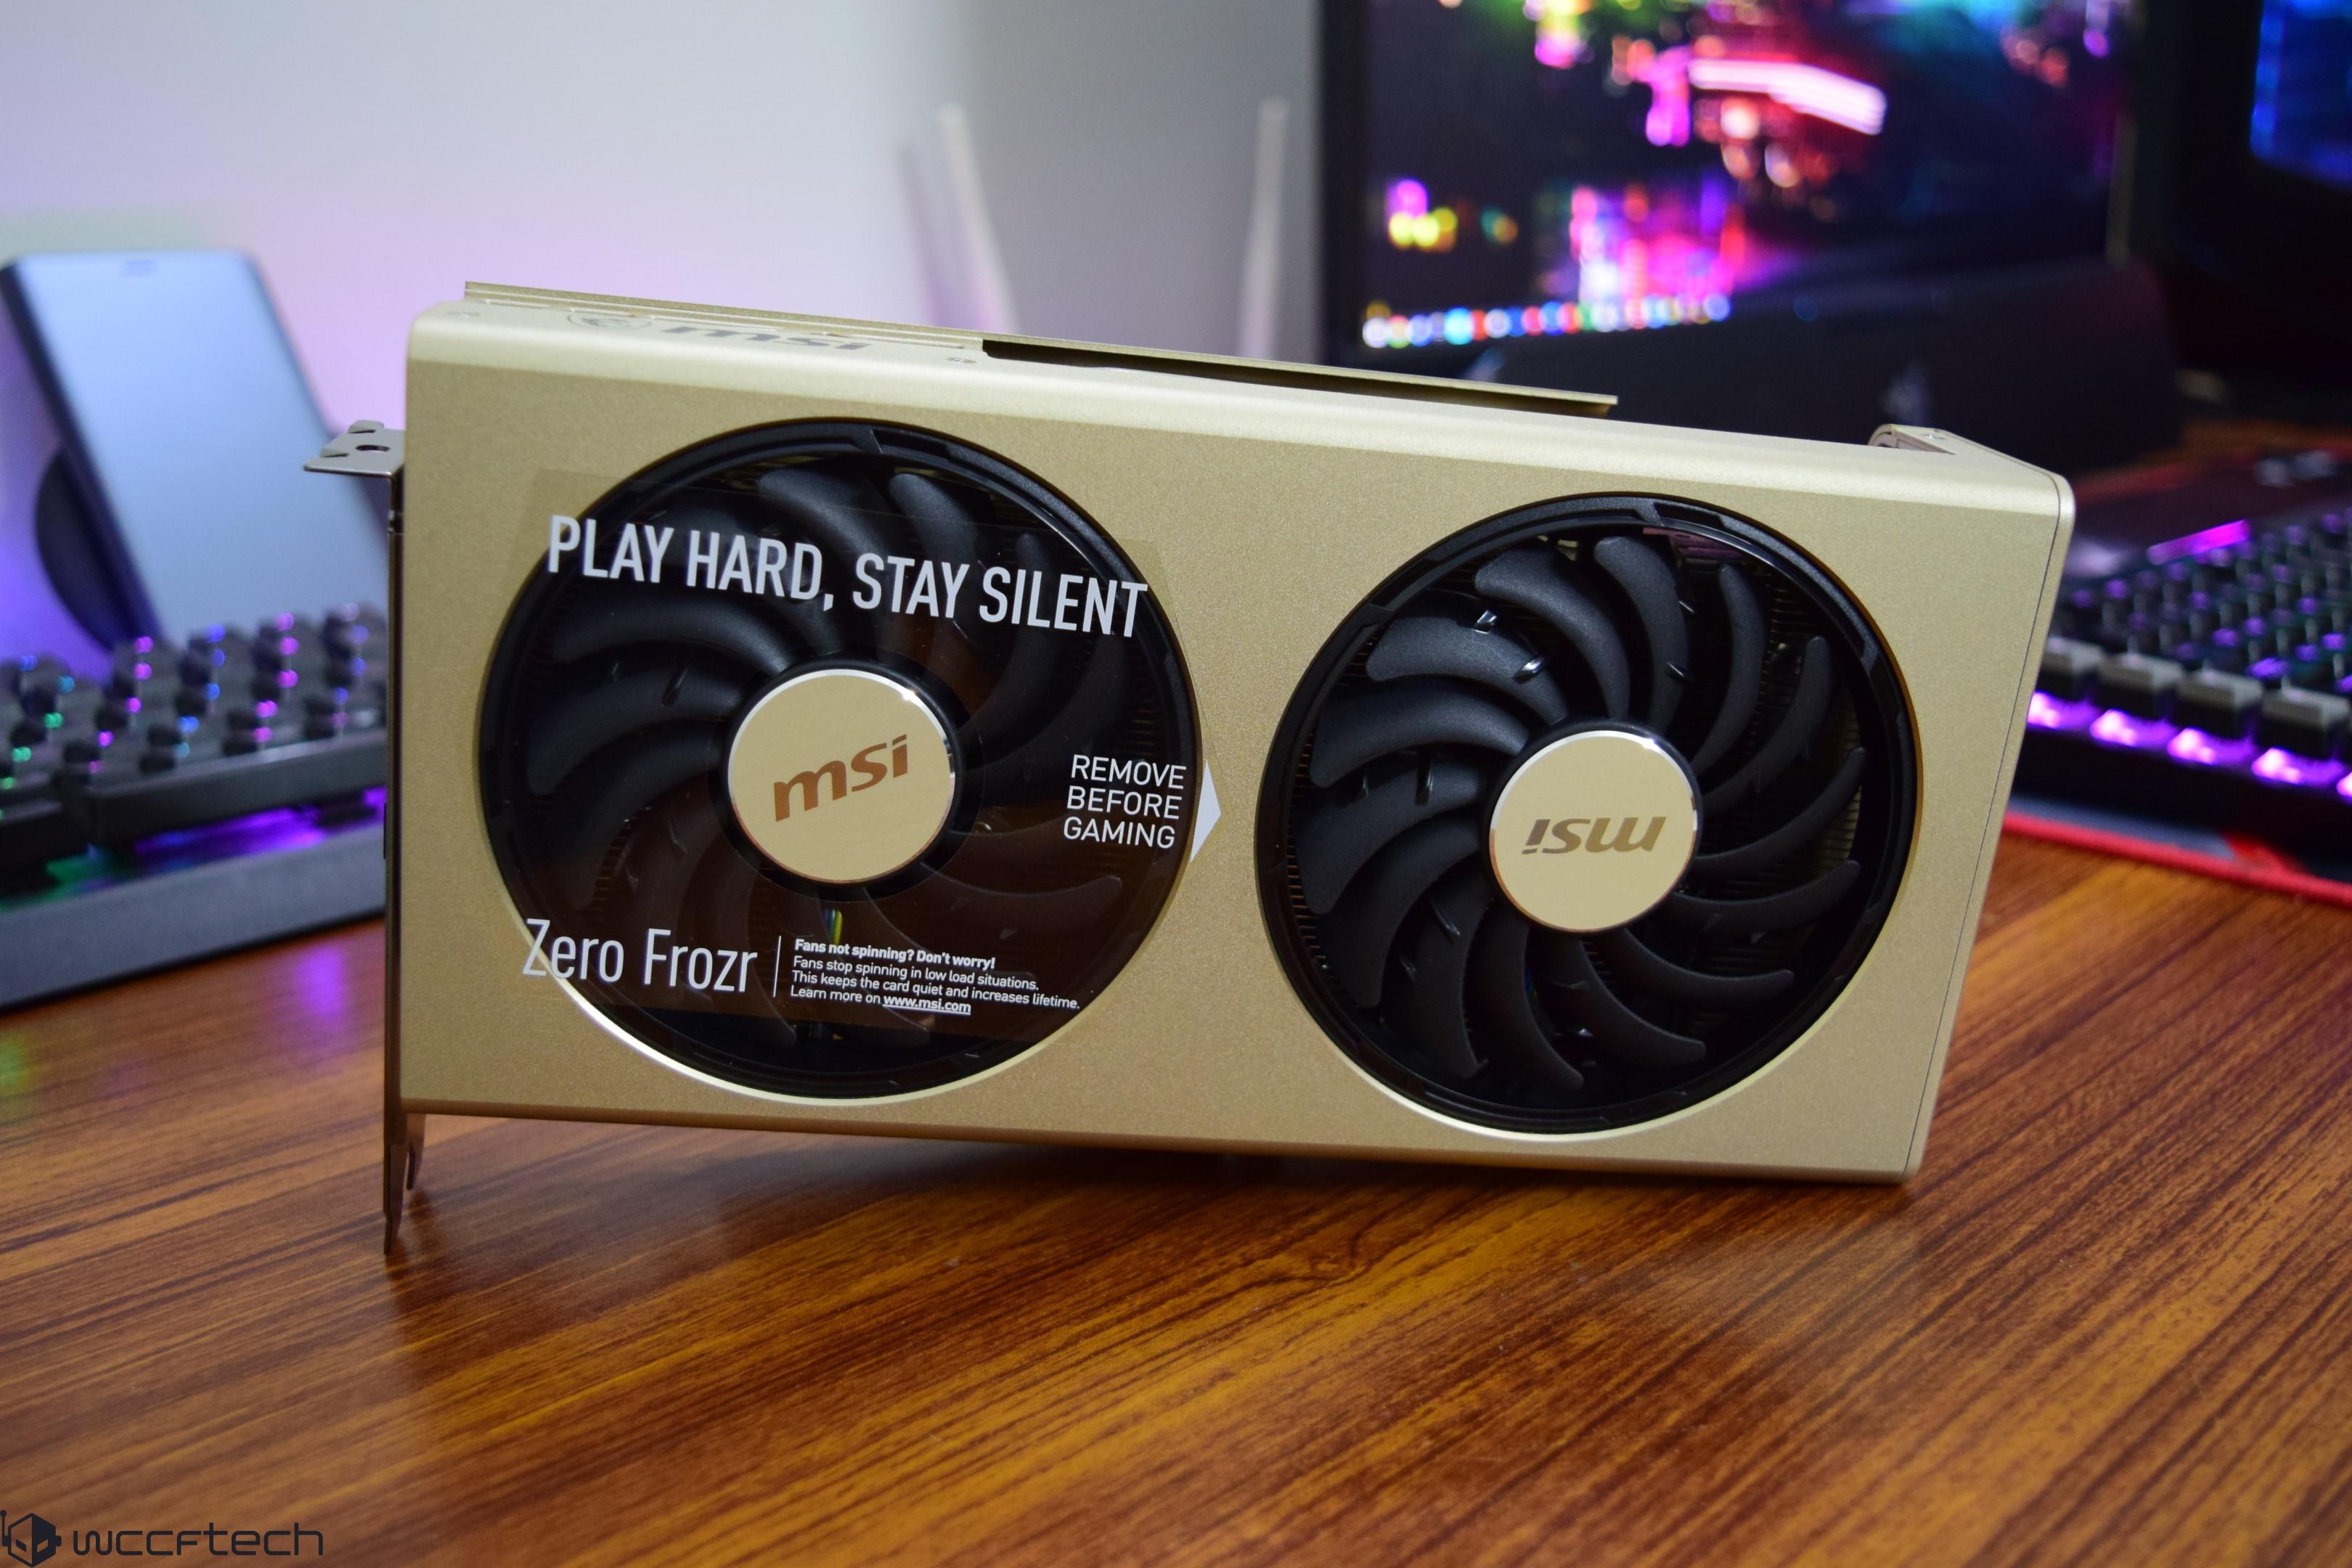 MSI Radeon RX 5700 XT EVOKE OC 8 GB Graphics Card Review – A